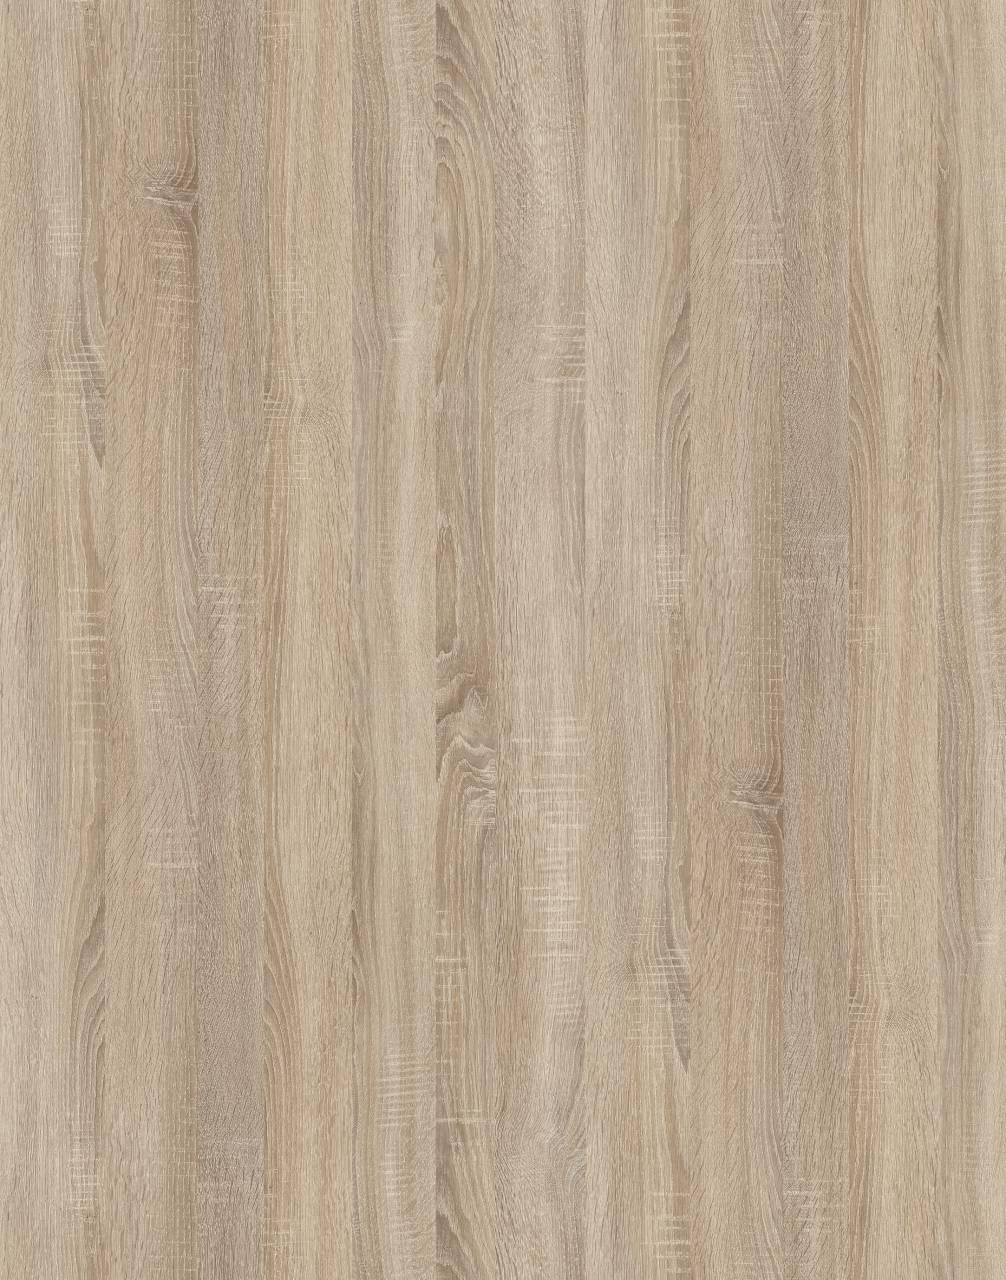 3025 Light Sonoma Oak (MF PB sample)